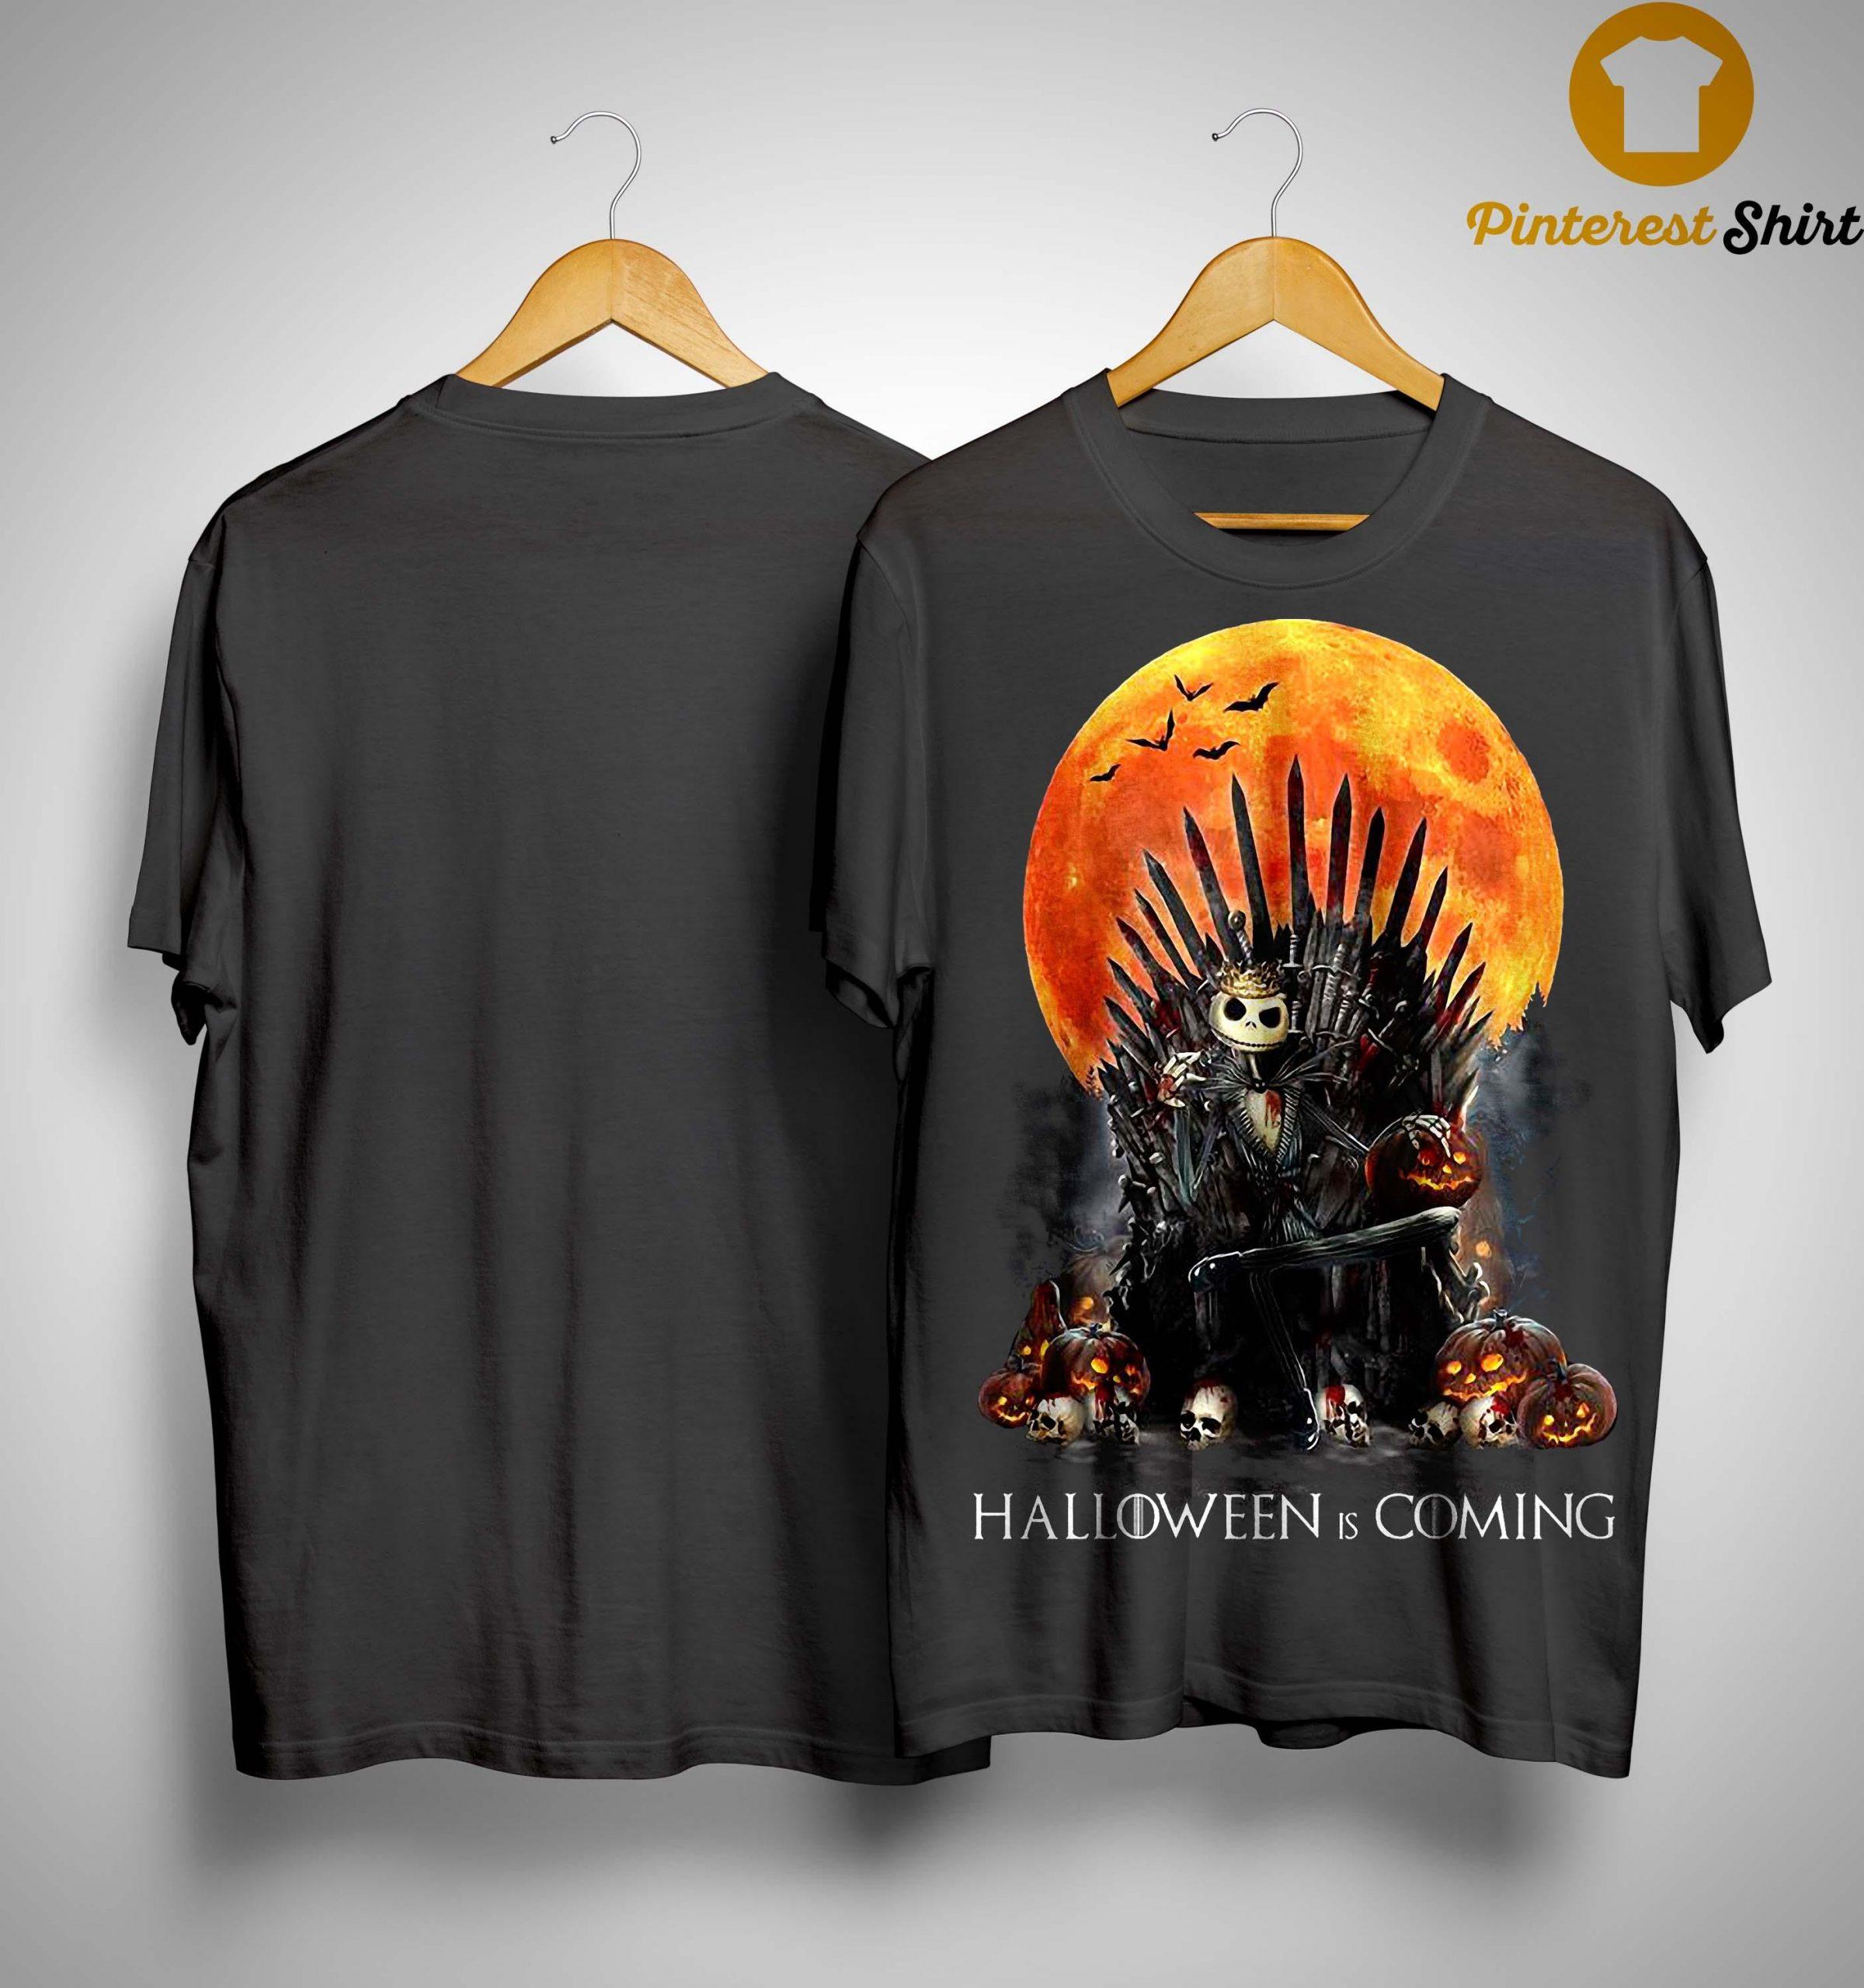 Iron Throne Jack Skellington Halloween Is Coming Shirt